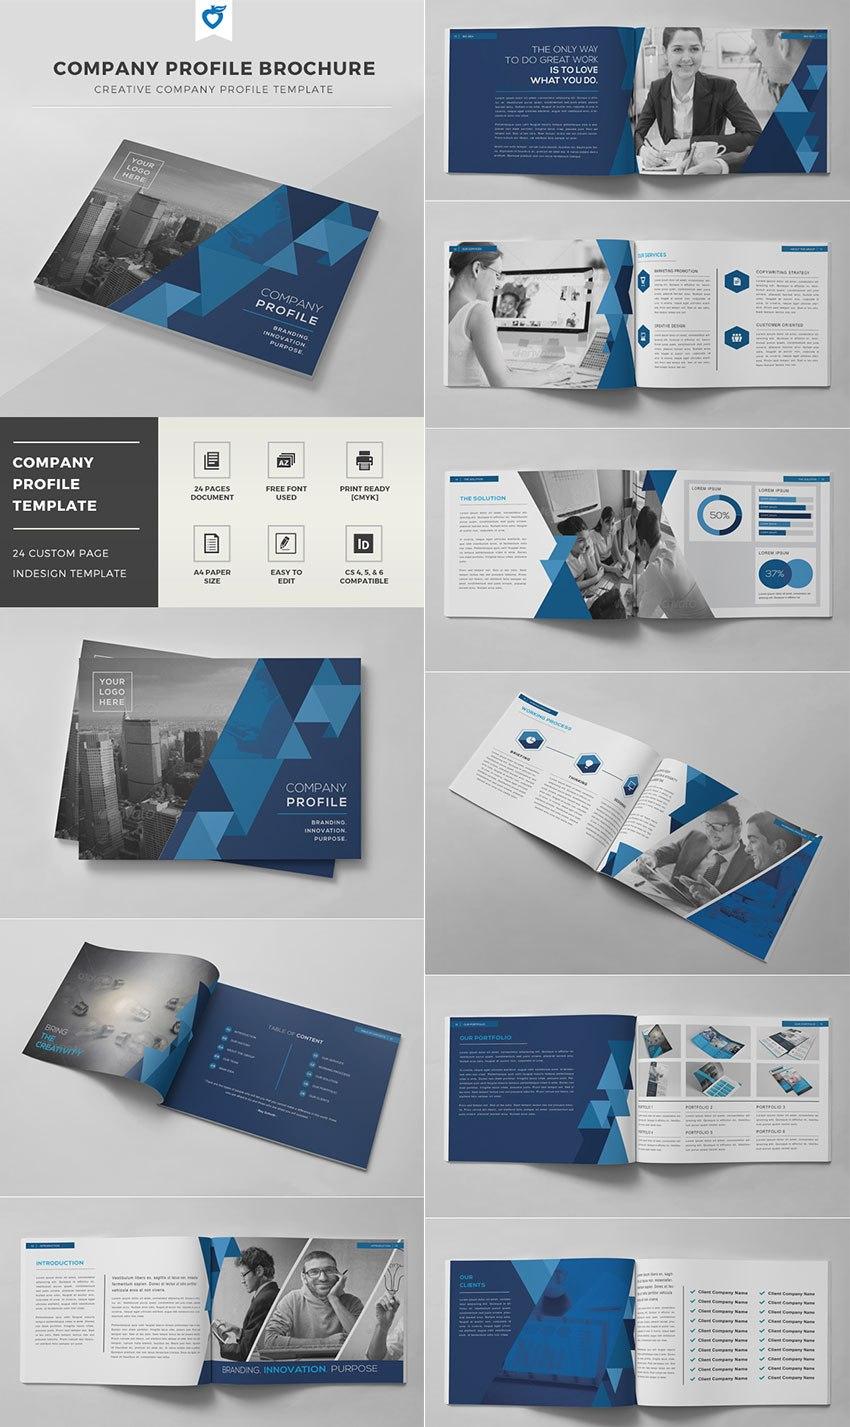 Best Indesign Brochure Templates  Creative Business Marketing In Good Brochure Templates